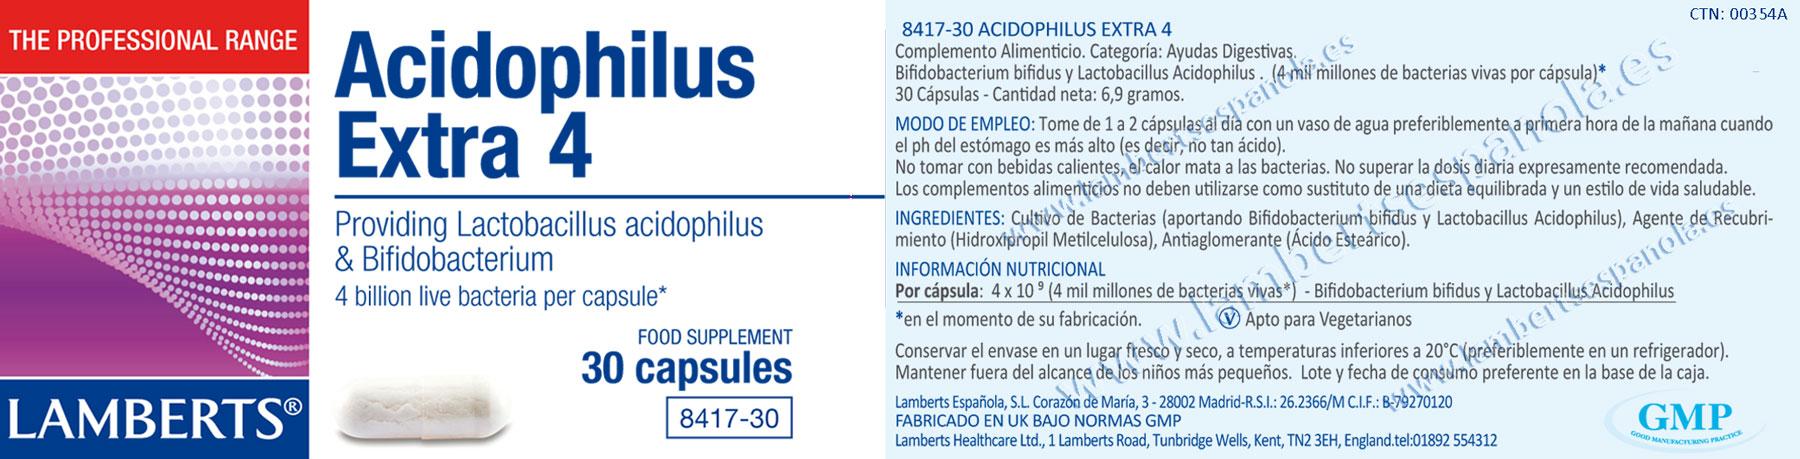 Acidófius